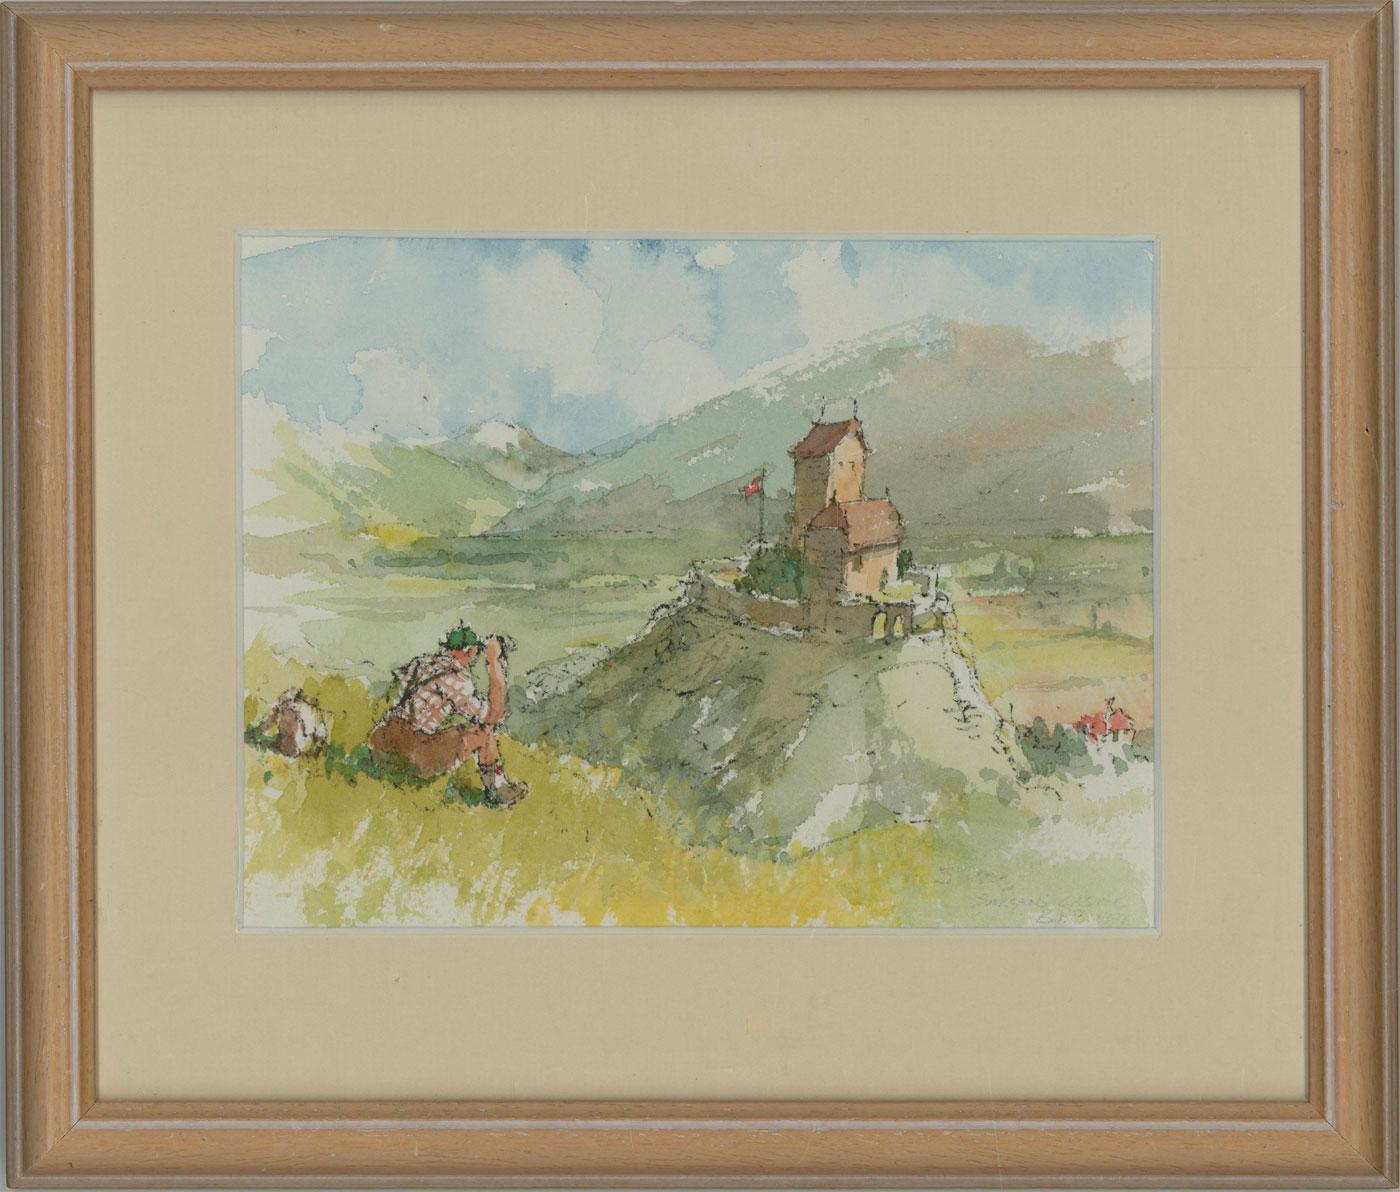 Bernard Philip Batchelor RWS - Mid 20C Watercolour, Sargans Castle, Switzerland